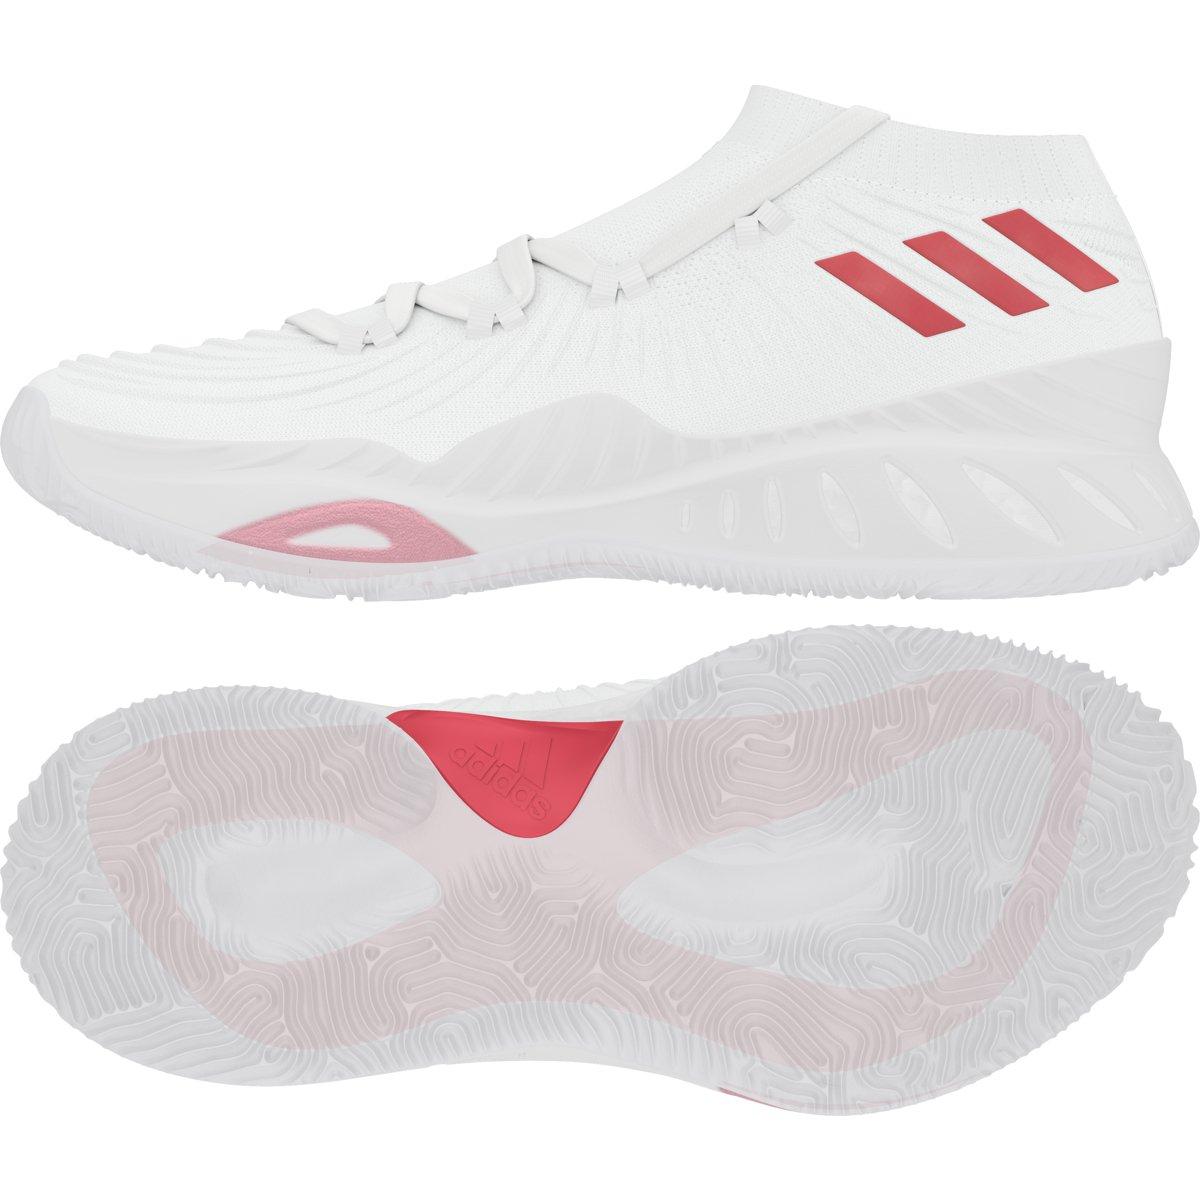 quality design 29844 e926d Amazon.com  adidas Crazy Explosive Low NBANCAA Shoe Mens Basketball 7.5  White-Scarlet  Basketball